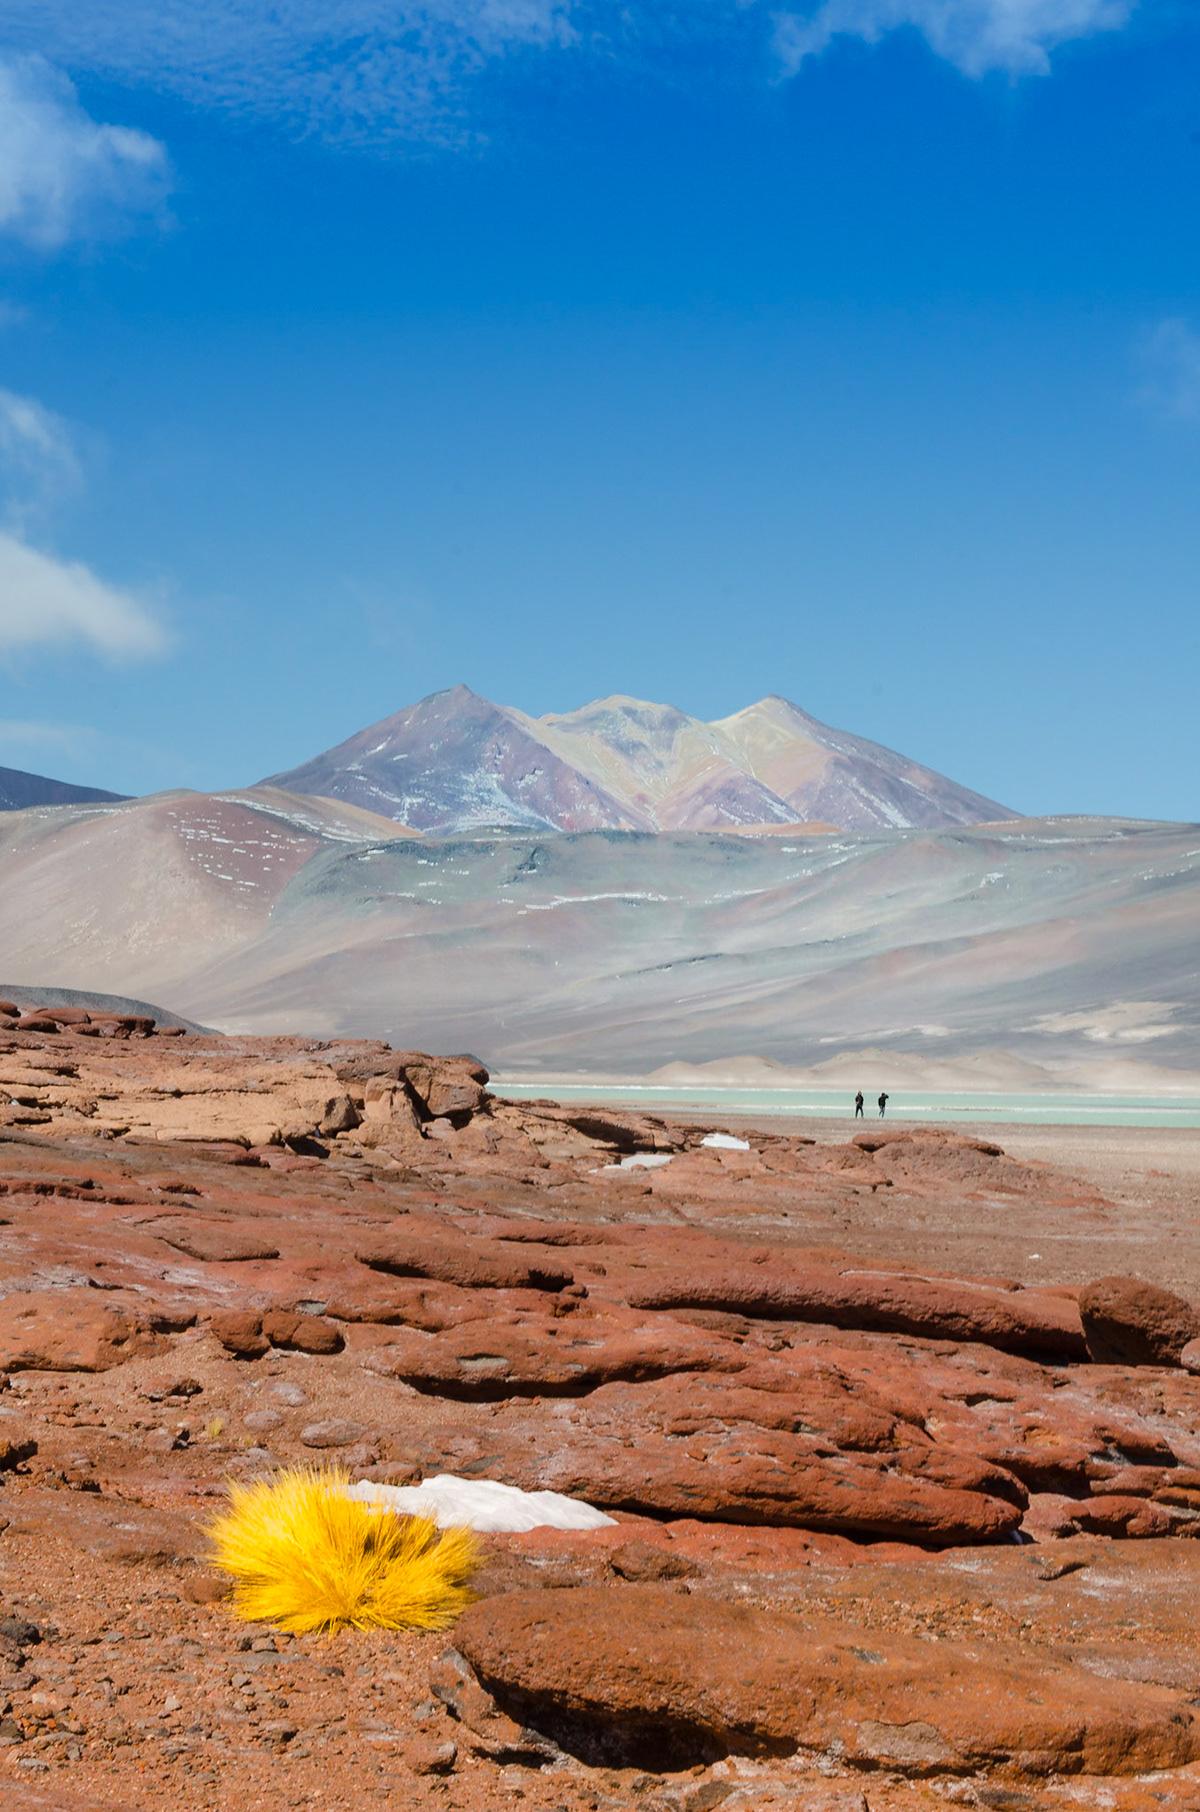 Adobe Portfolio people Travel world Landscape Little Audacious human race adventure